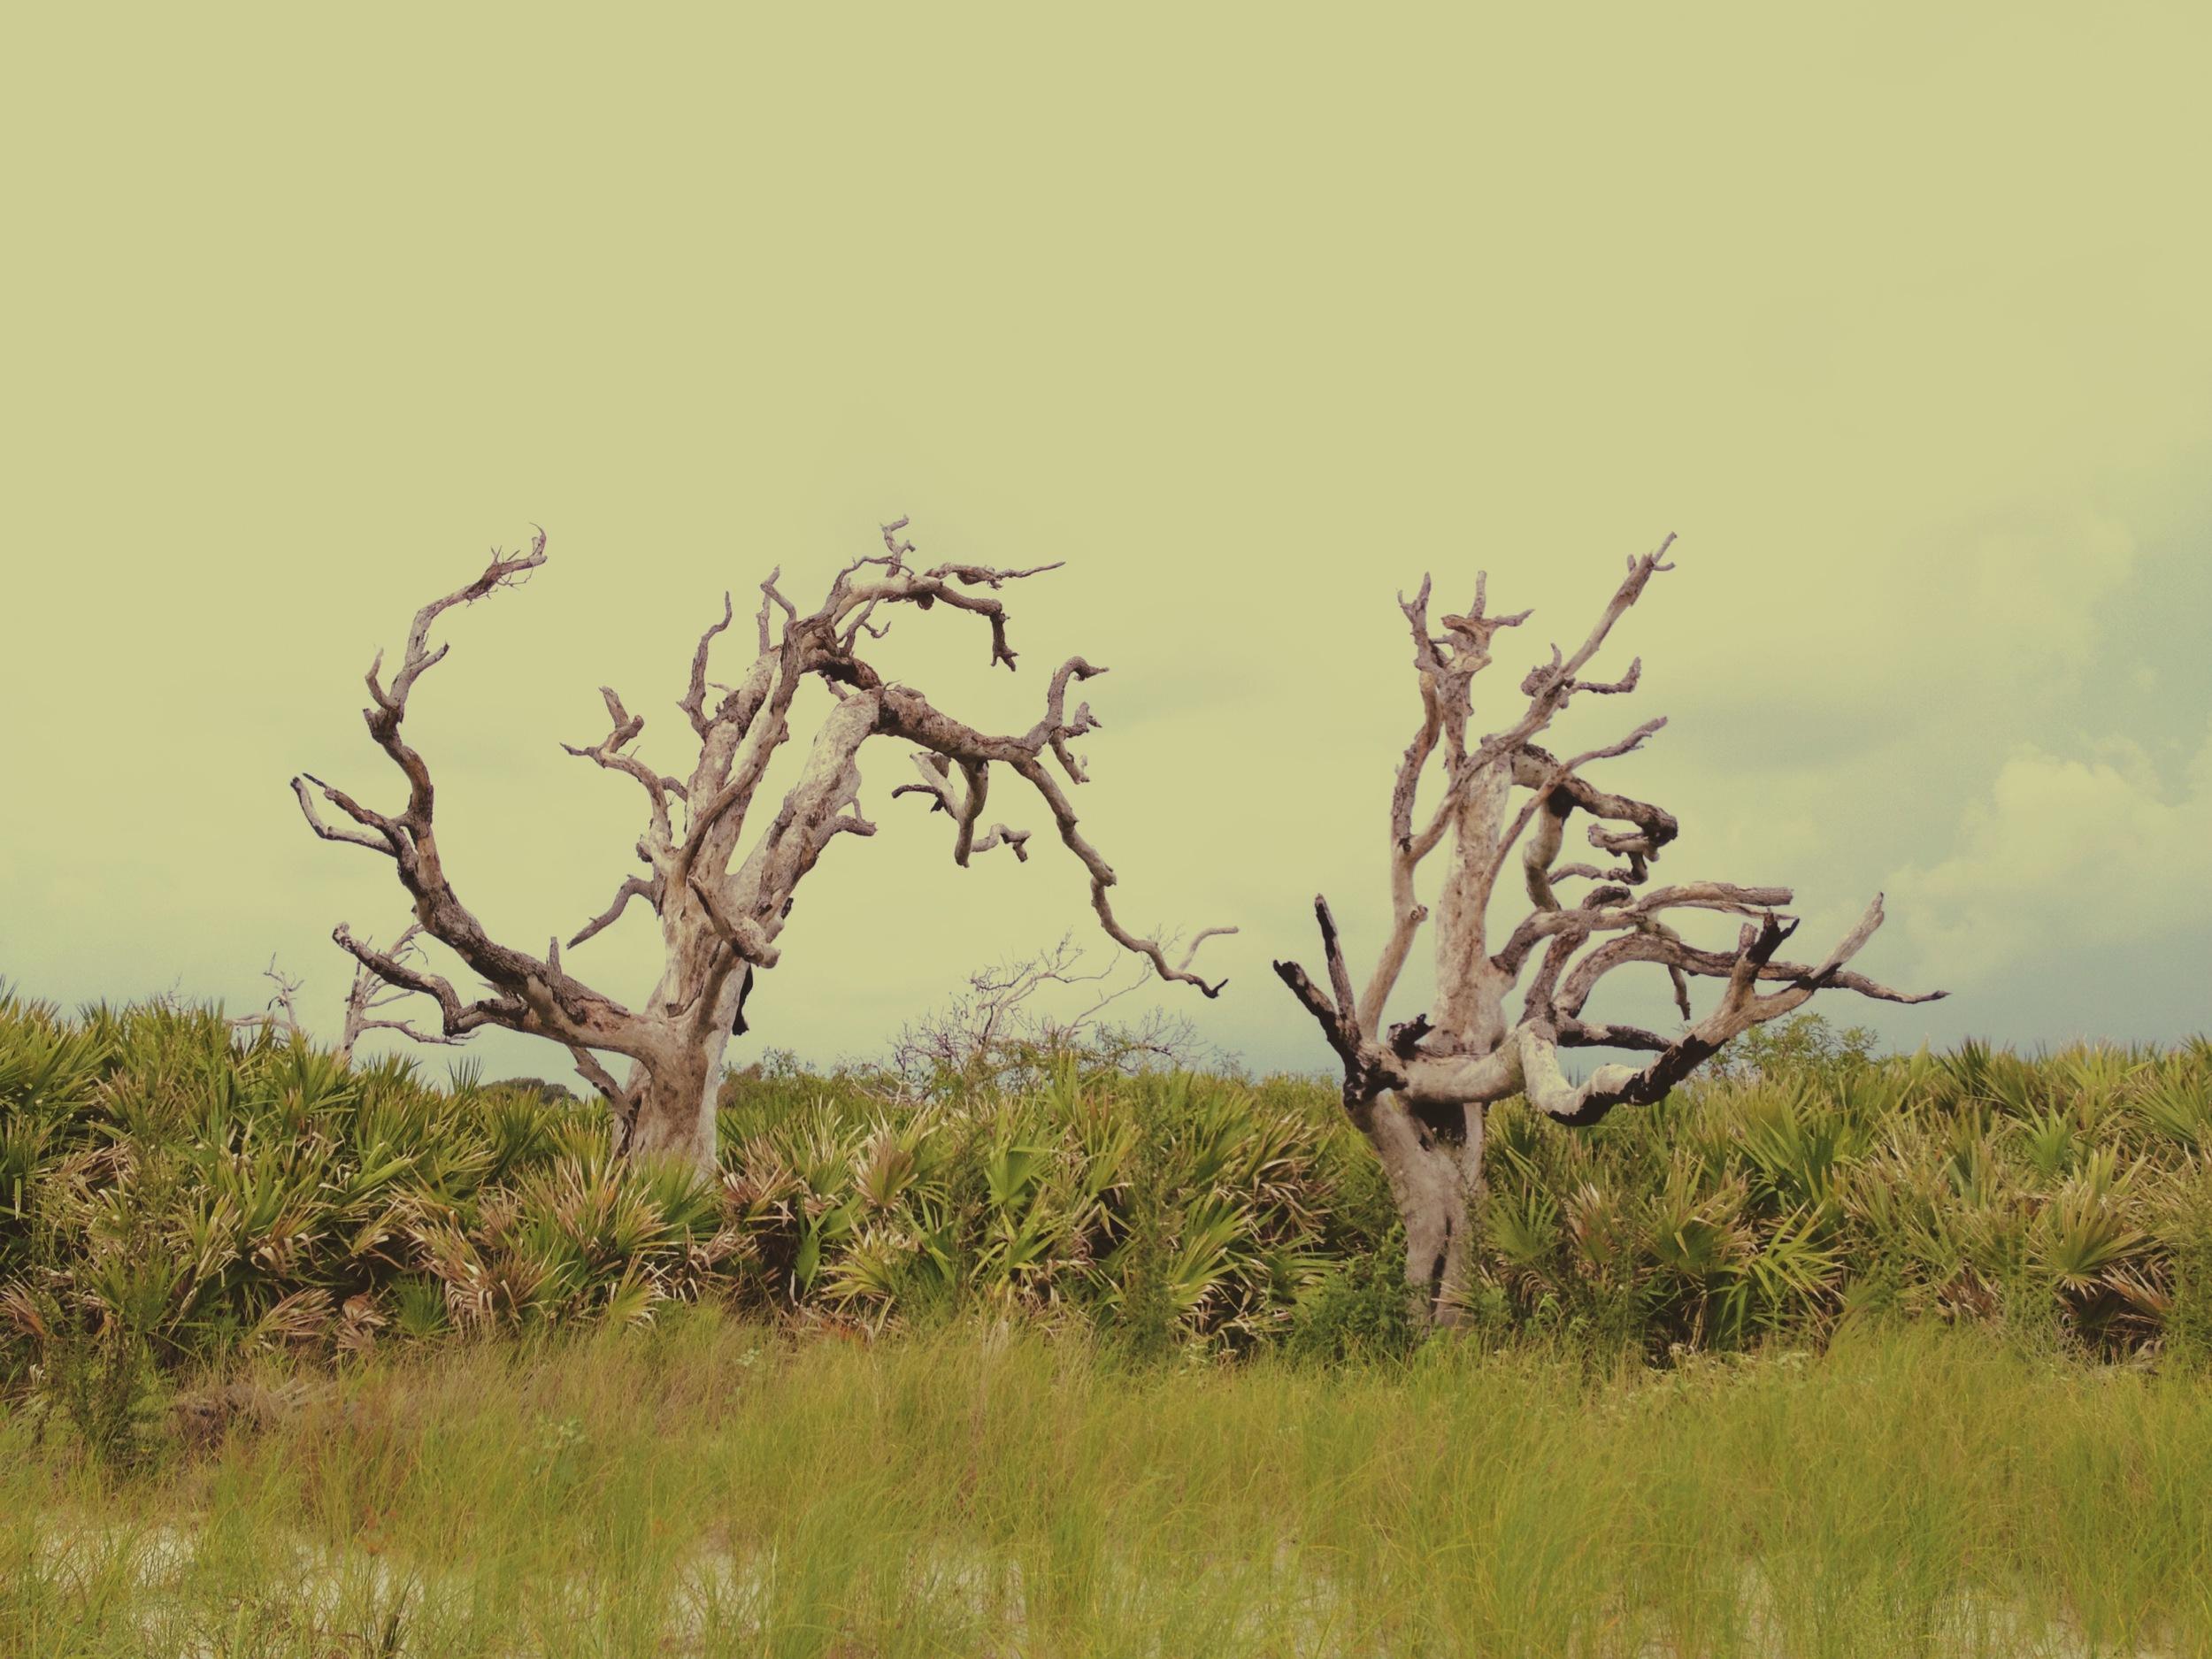 Driftwood / Blackbeard Island National Wildlife Refuge 2014 © Manda Faye Dunigan